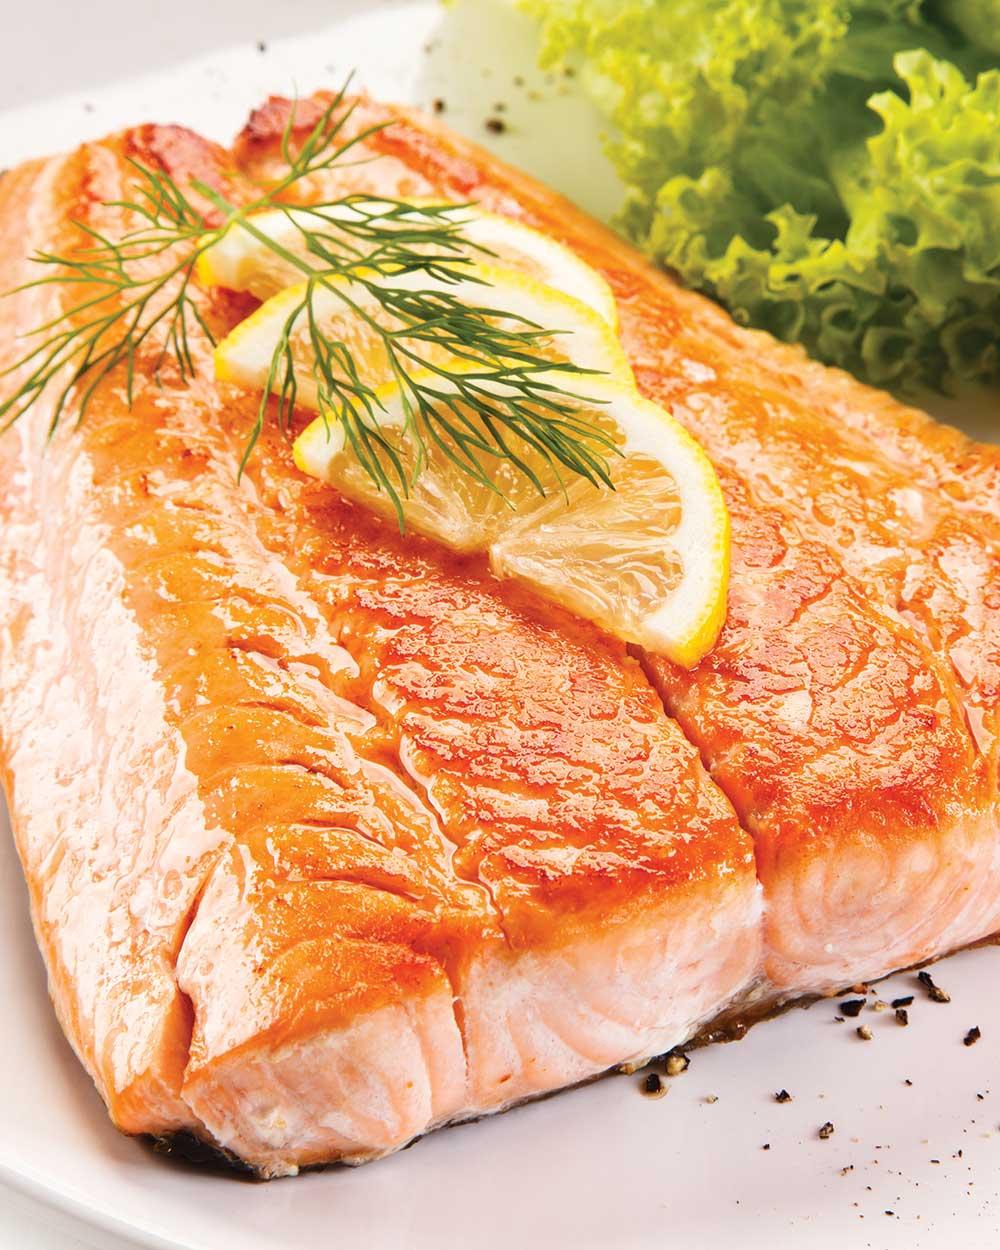 Broiled Sockeye Salmon with Citrus Glaze